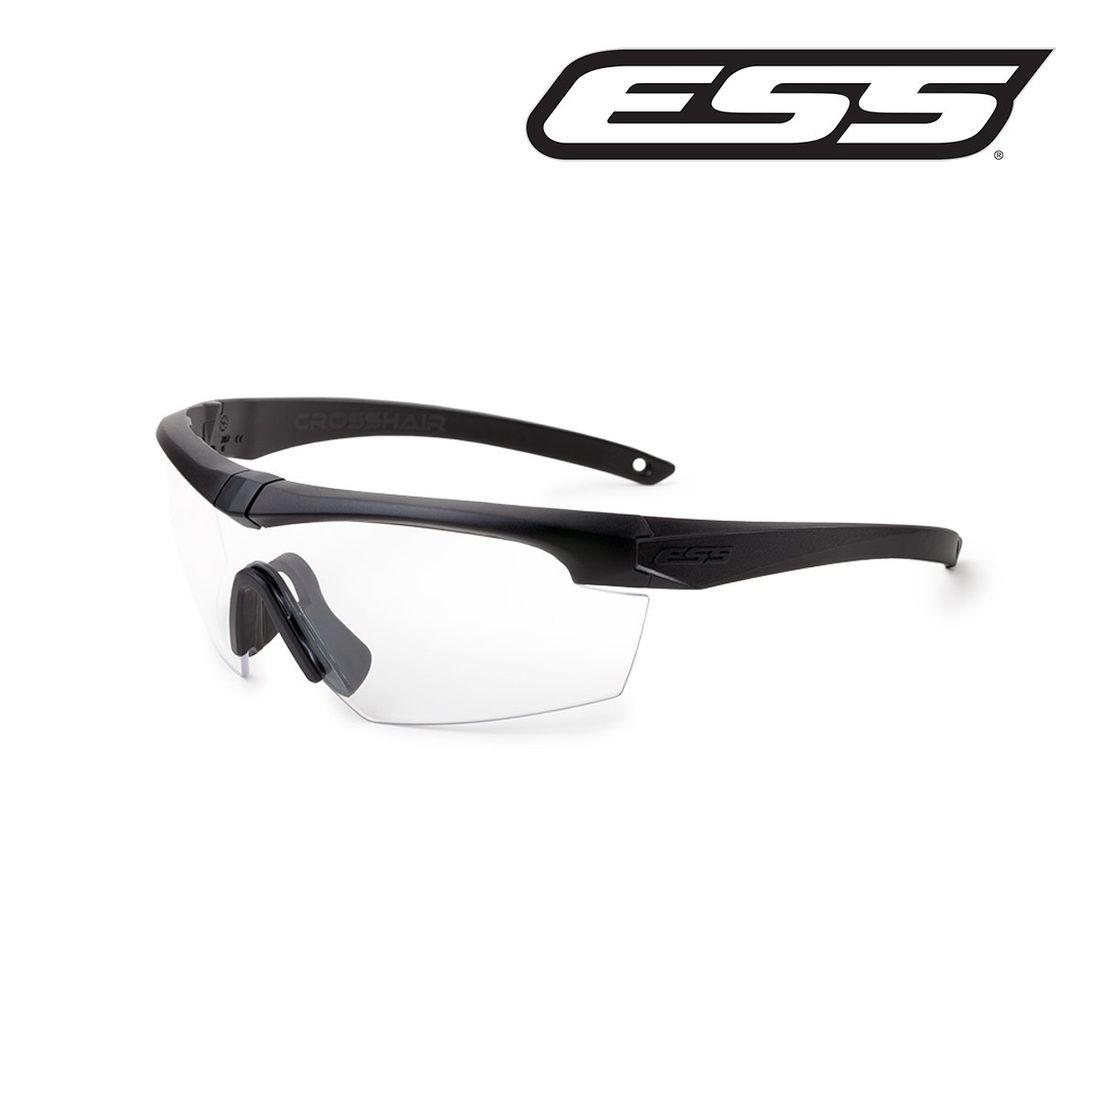 f81486d1ee991 Crosshair One clair. Lunette balistique Crosshair™ one clair ESS